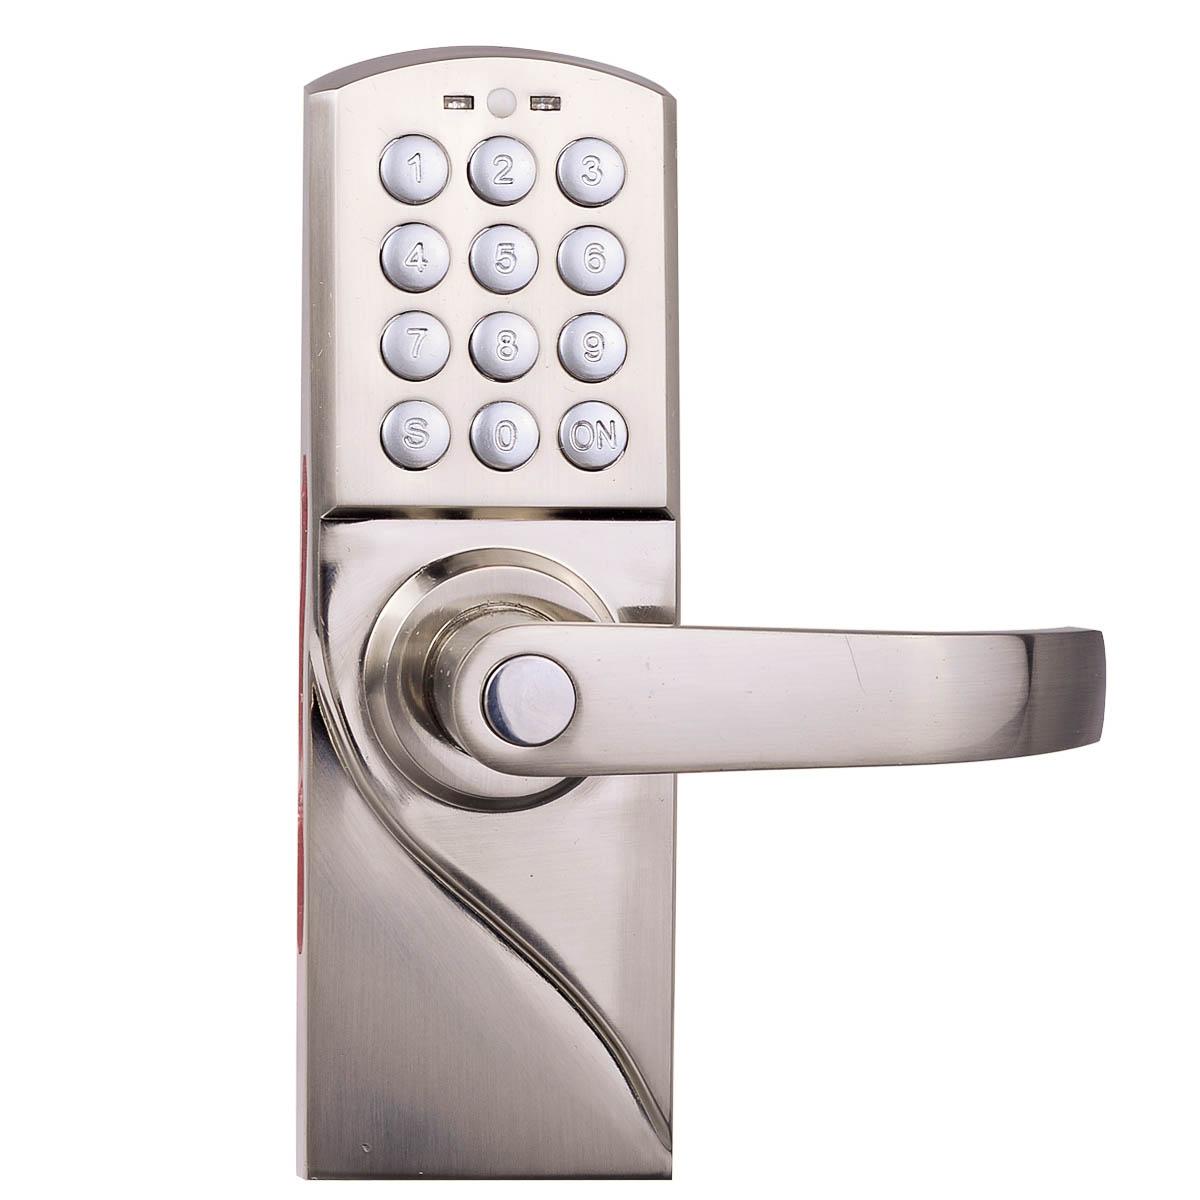 keypad door knob photo - 2